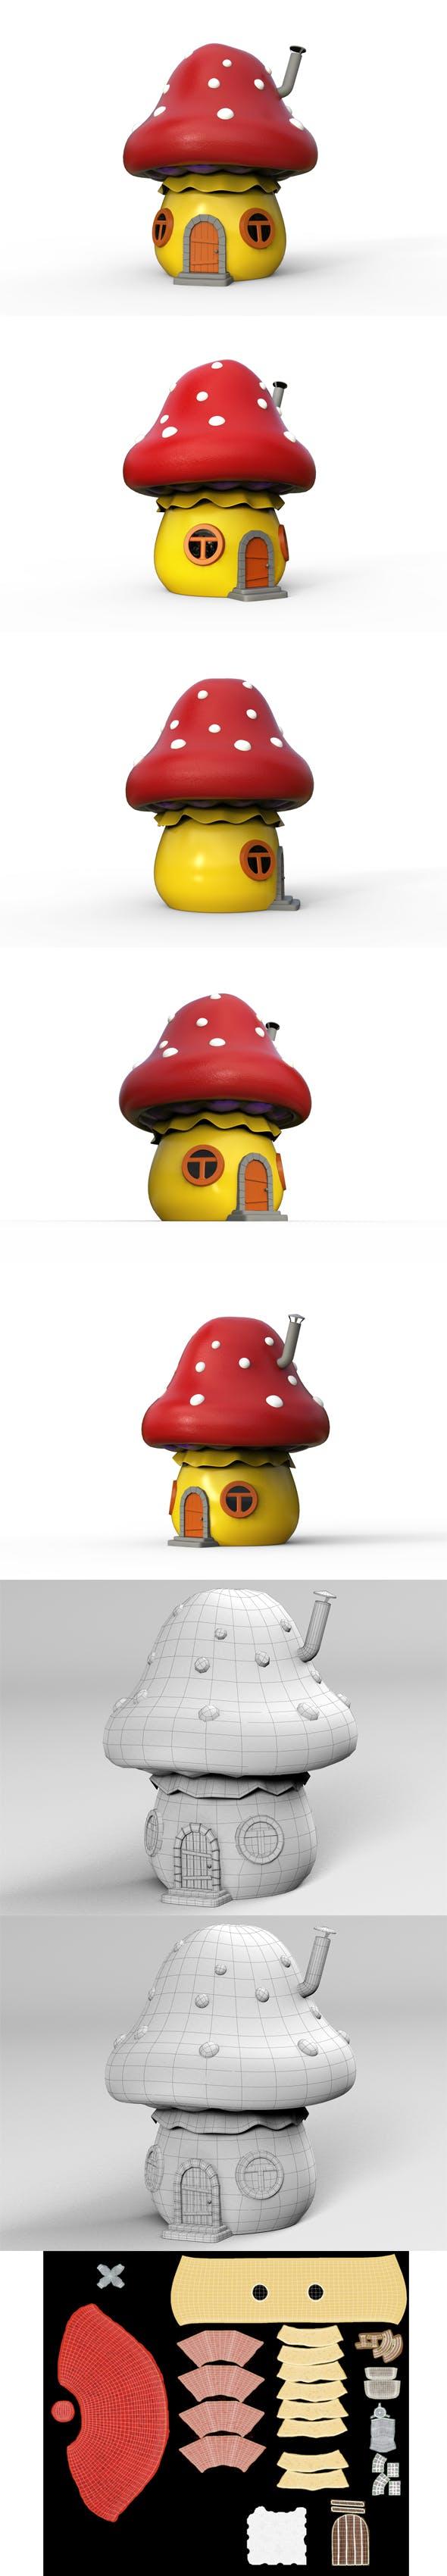 Cartoon house mushroom - 3DOcean Item for Sale